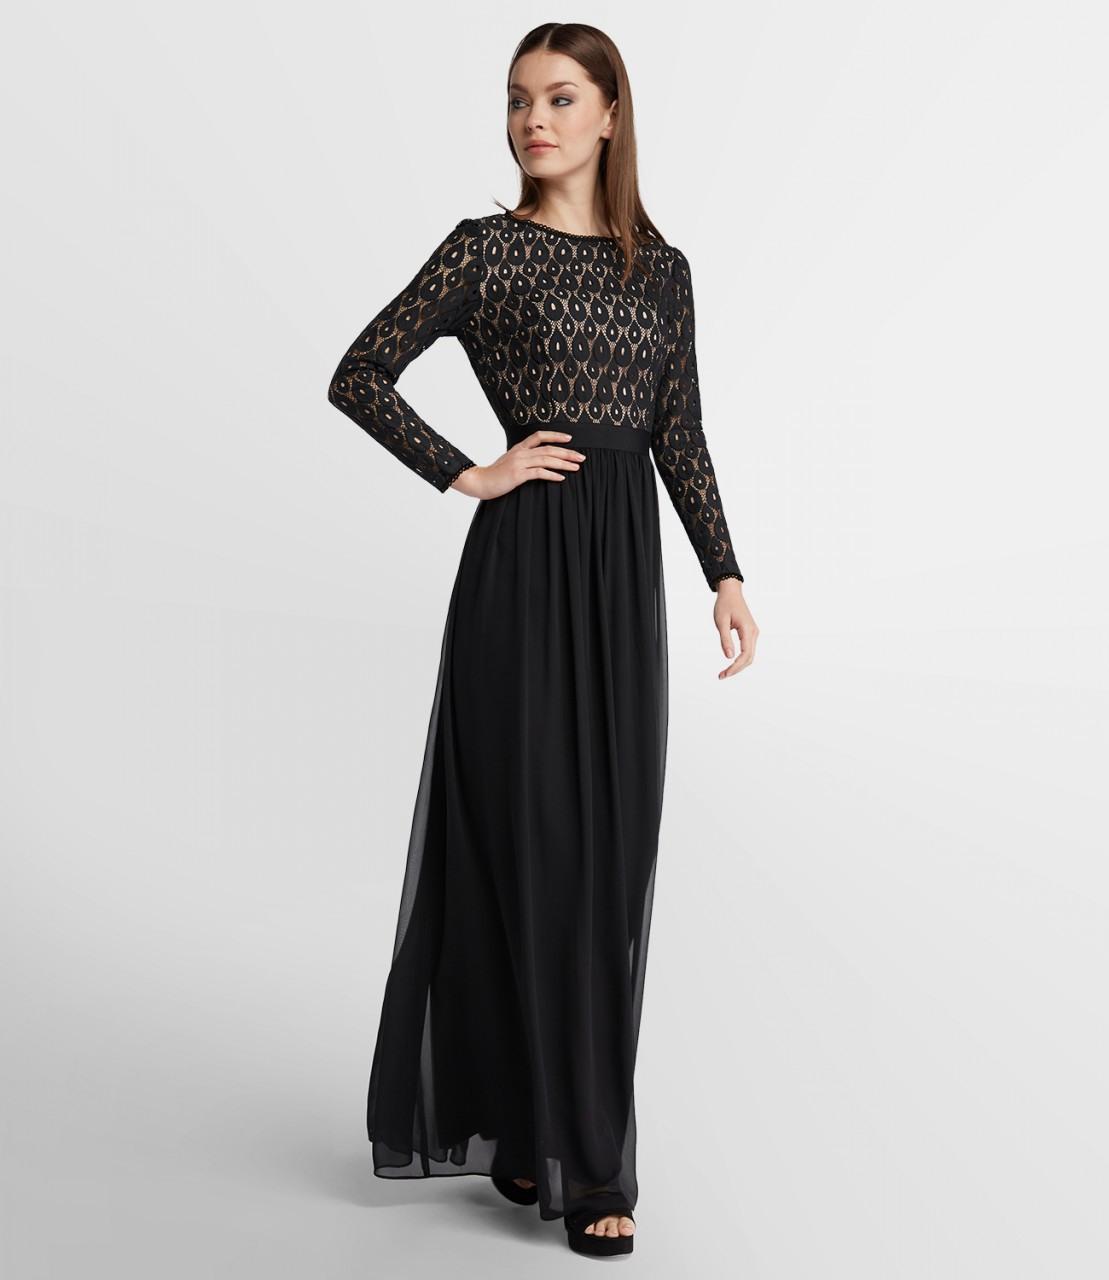 Designer Wunderbar Abendkleid Apart StylishFormal Genial Abendkleid Apart Stylish